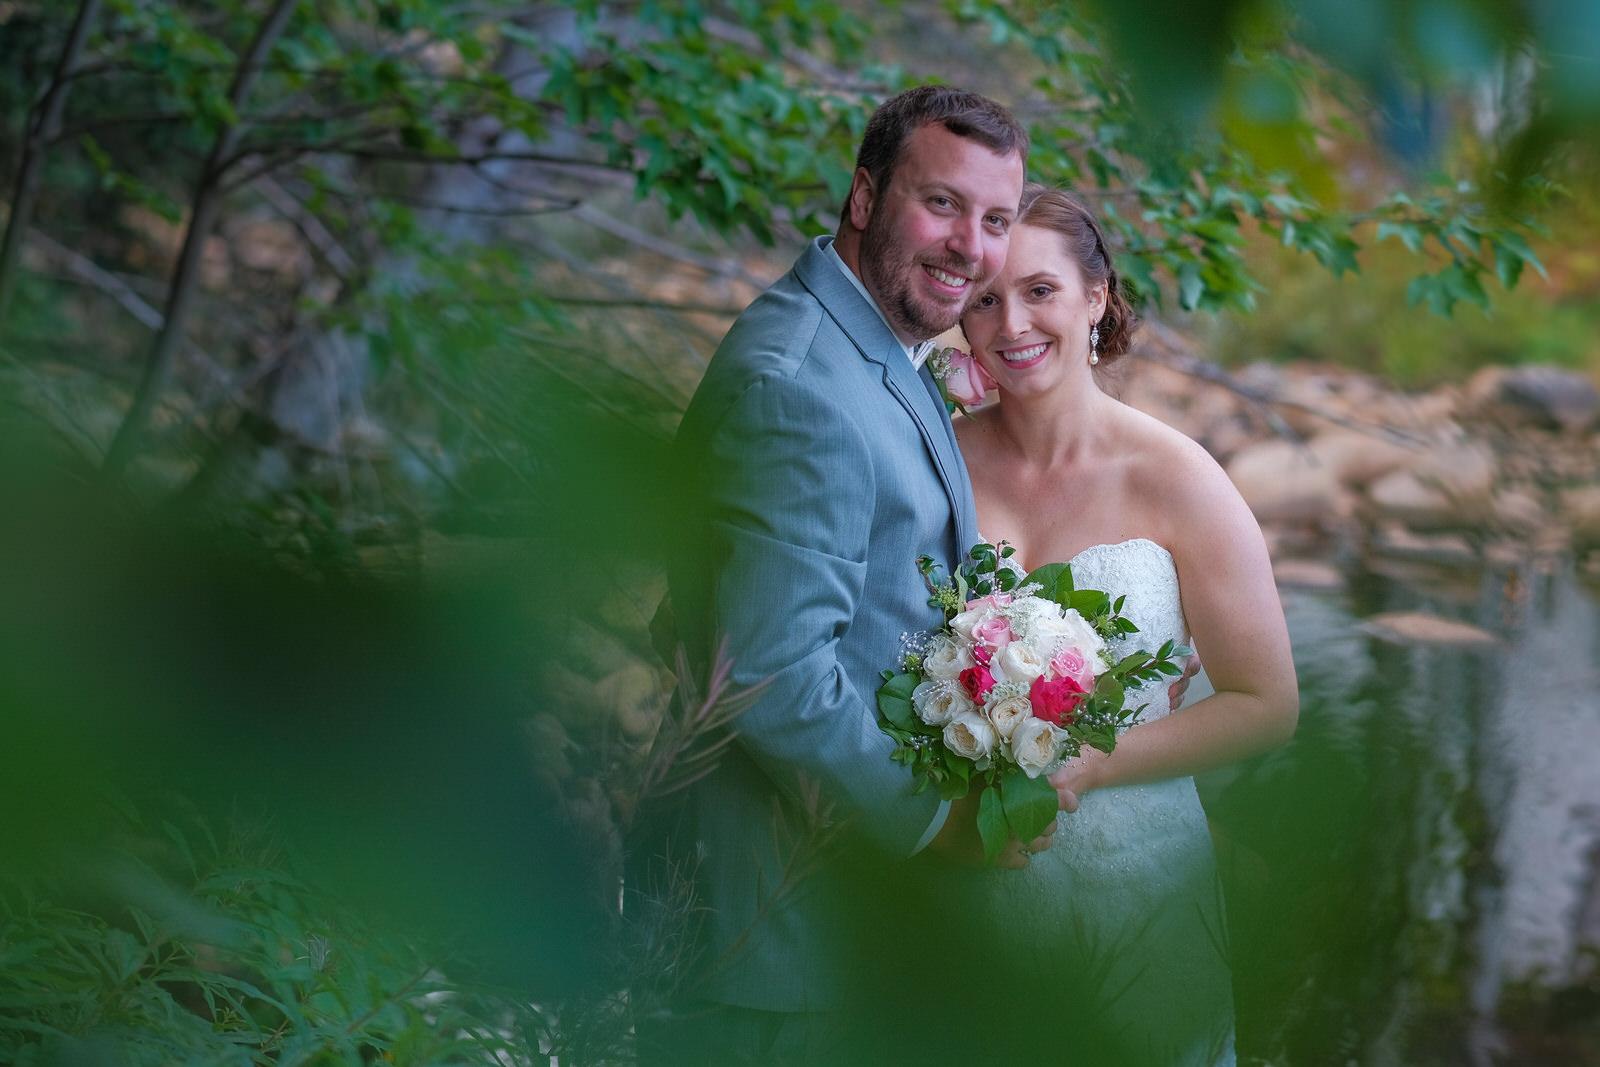 waterville-valley-wedding-photography-1252-12.jpg